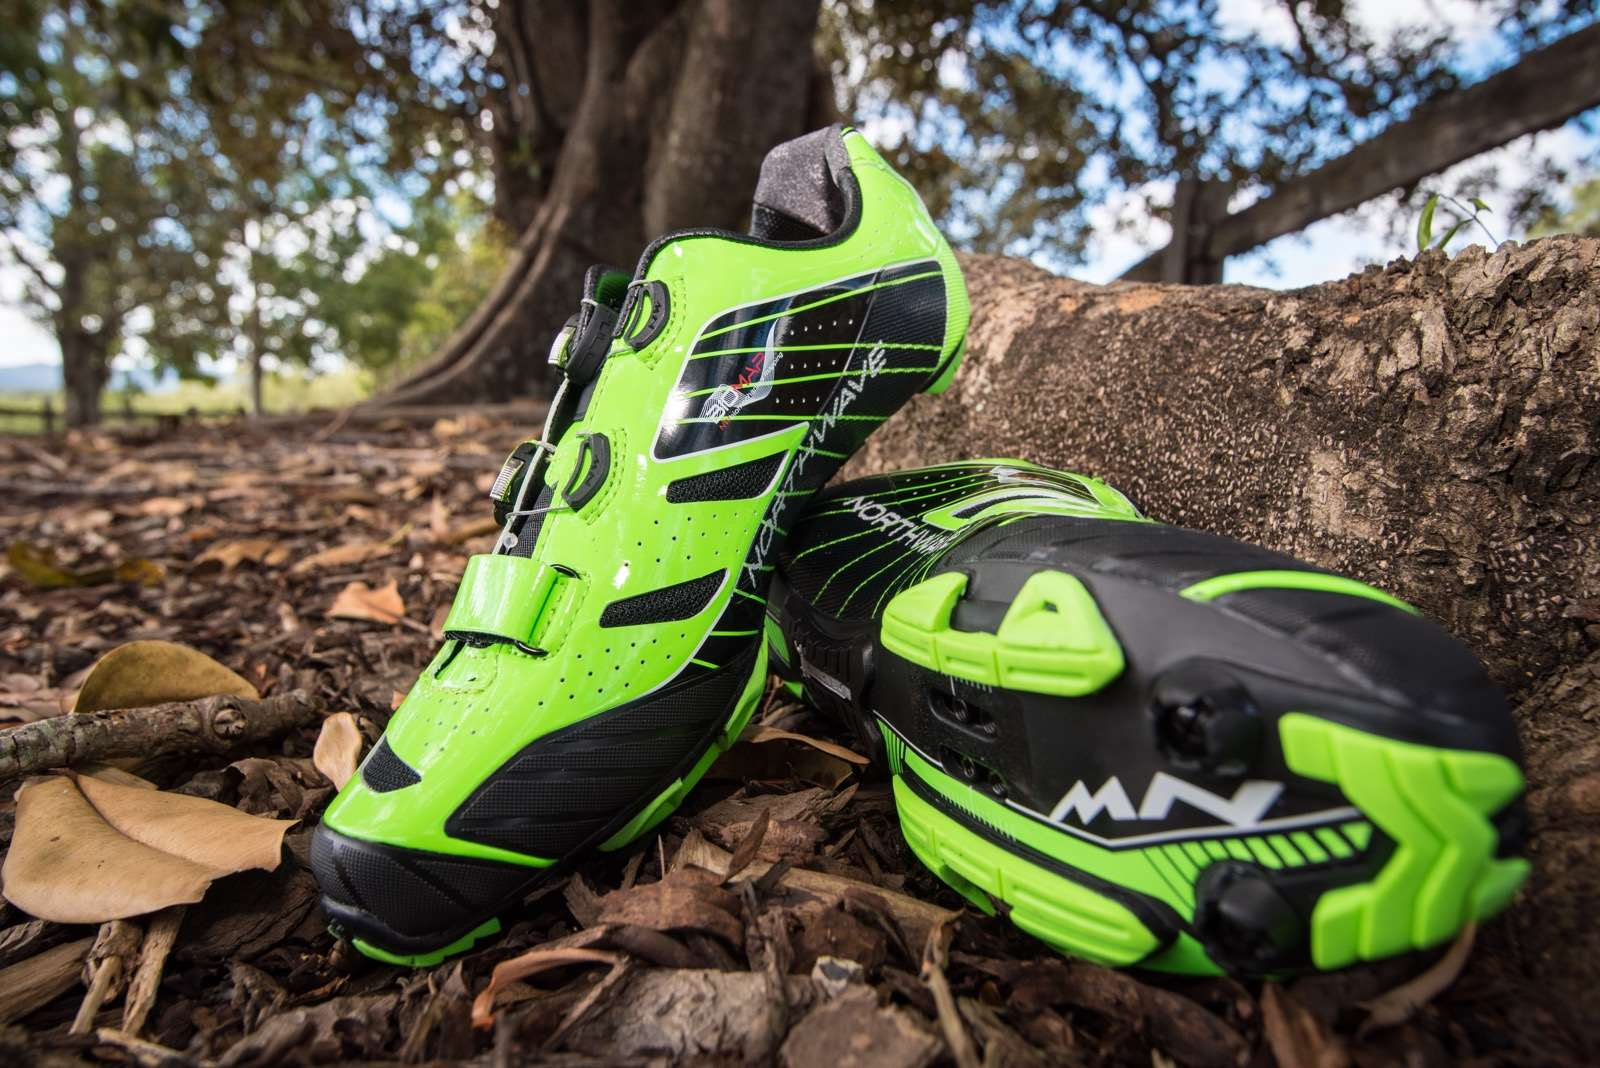 Tested Northwave Extreme Xc Shoes Australian Mountain